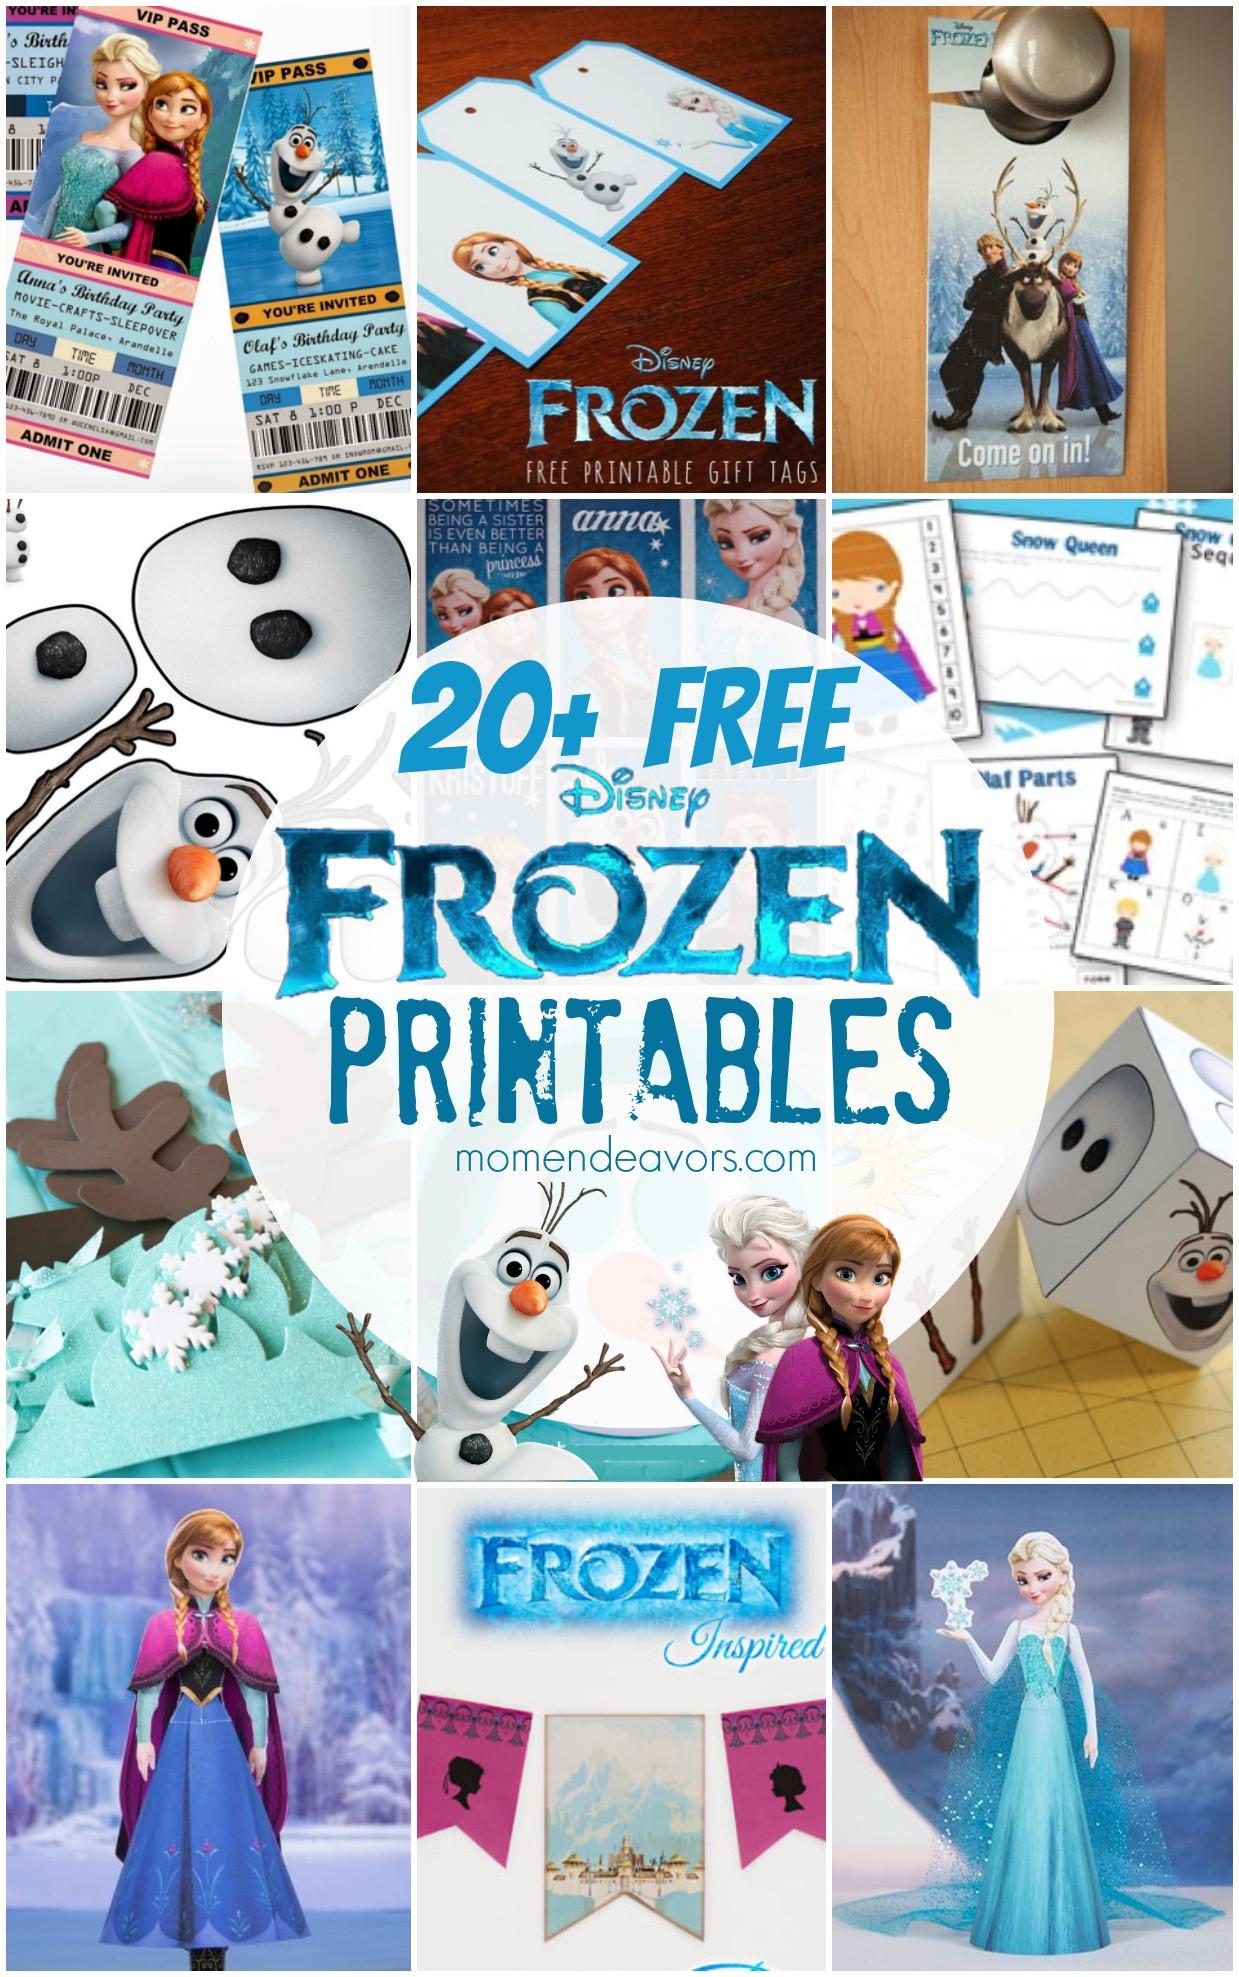 Frozen Printable Birthday Invitations 20 Free Disney Frozen Printables Activity Sheets & Party